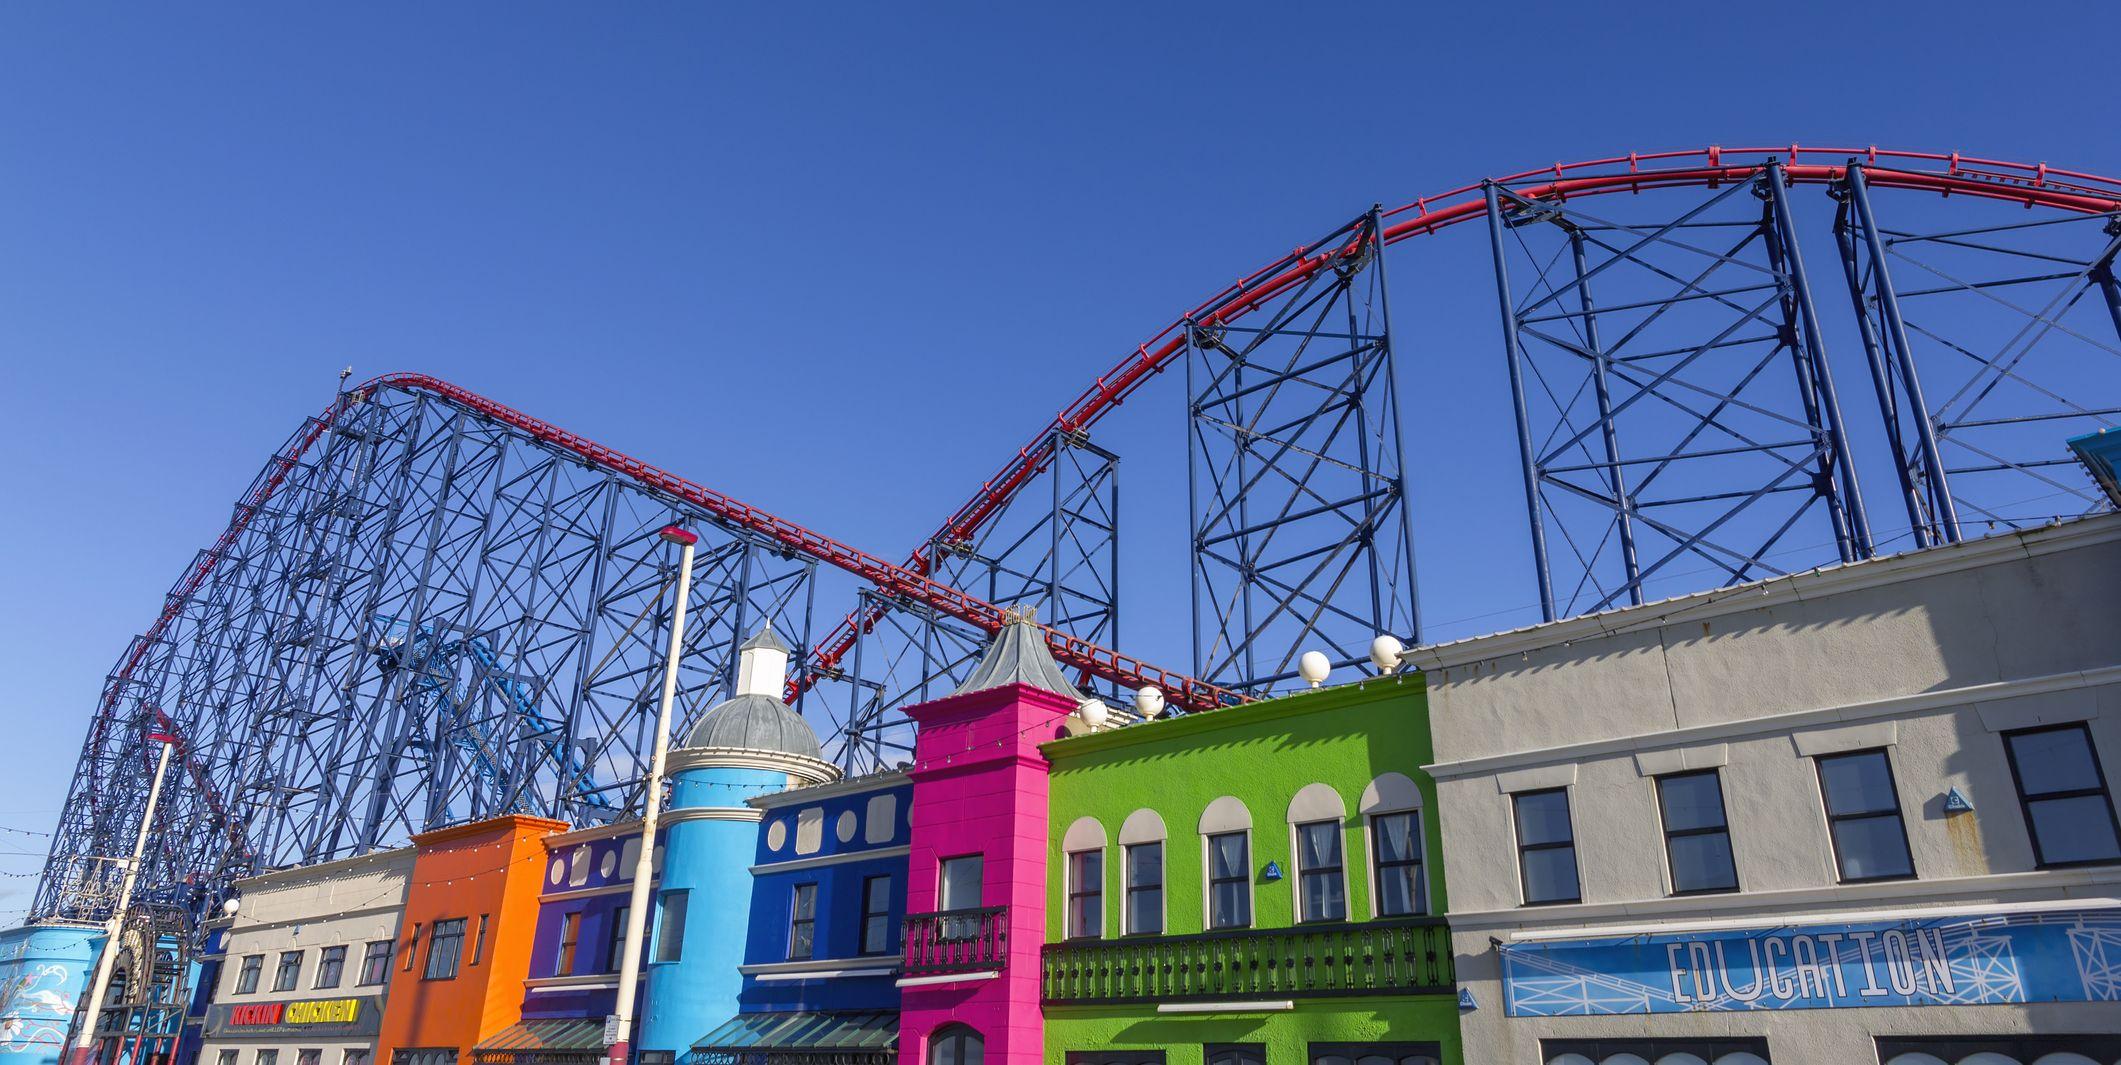 Blackpool theme park